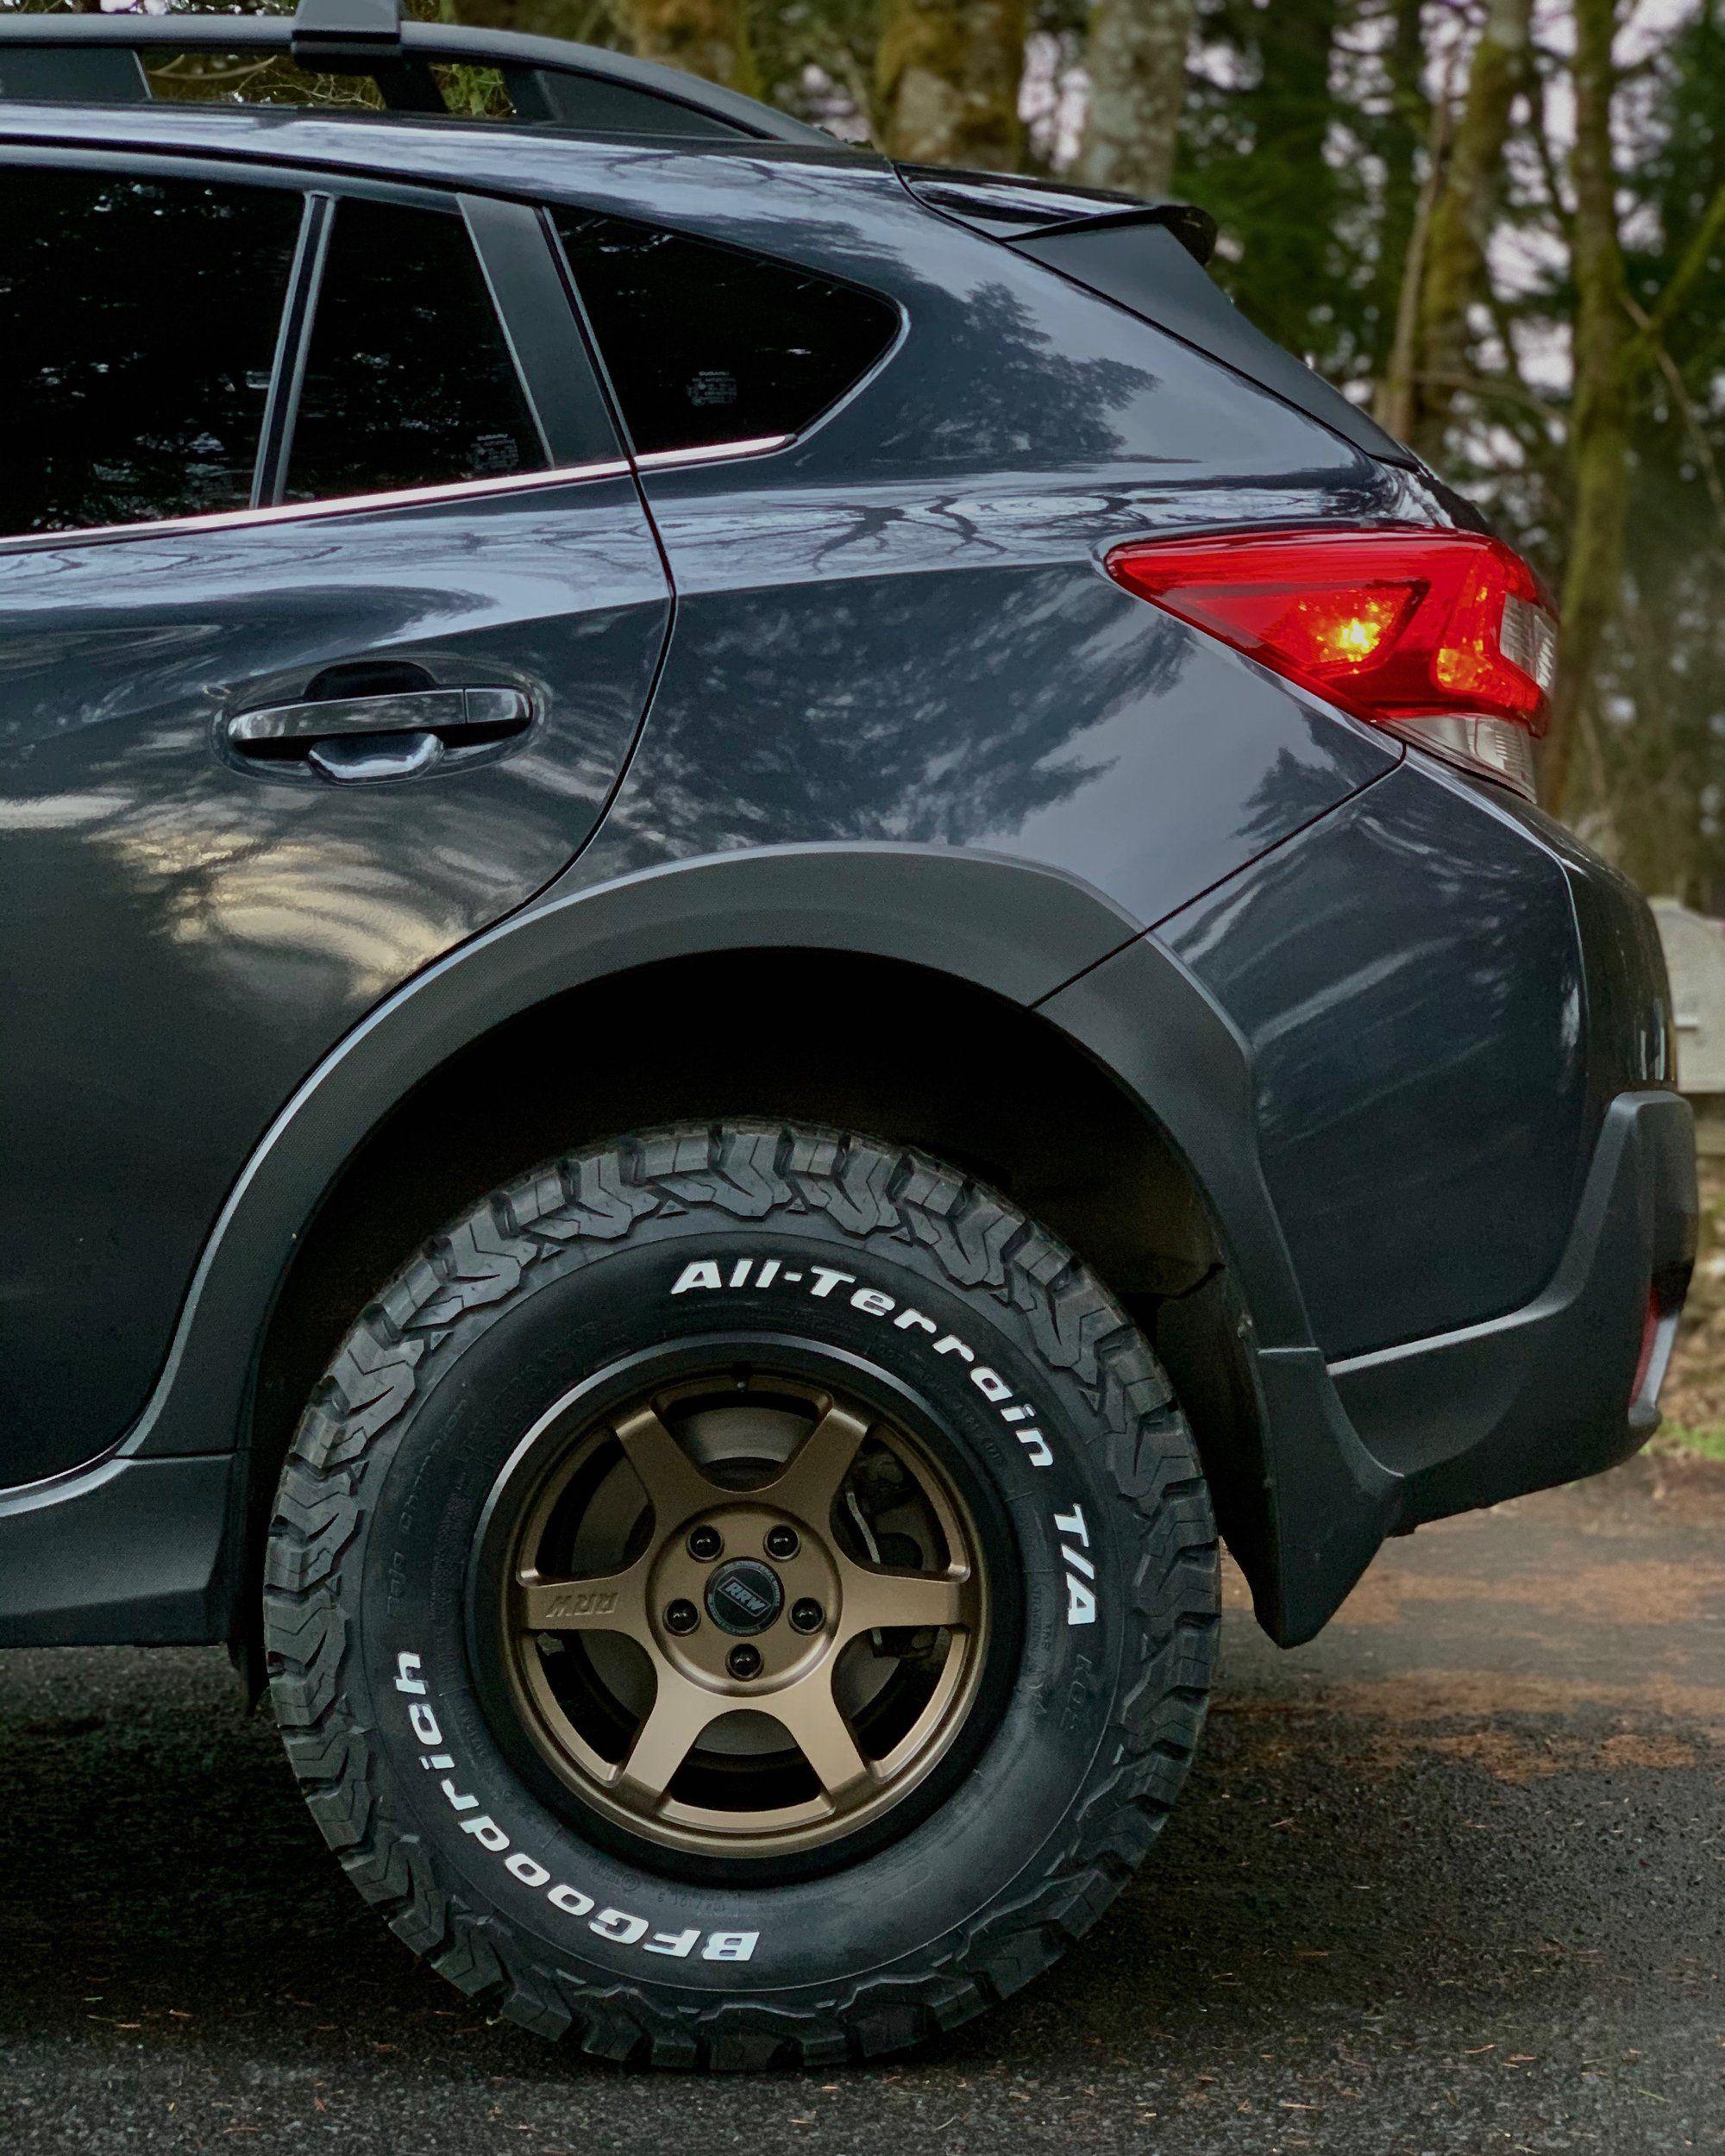 Subaru Crosstrek Xv 15x7 Off Road Wheels From Rrw Relations Race Wheels In 2021 Subaru Crosstrek Subaru Crosstrek Accessories Subaru